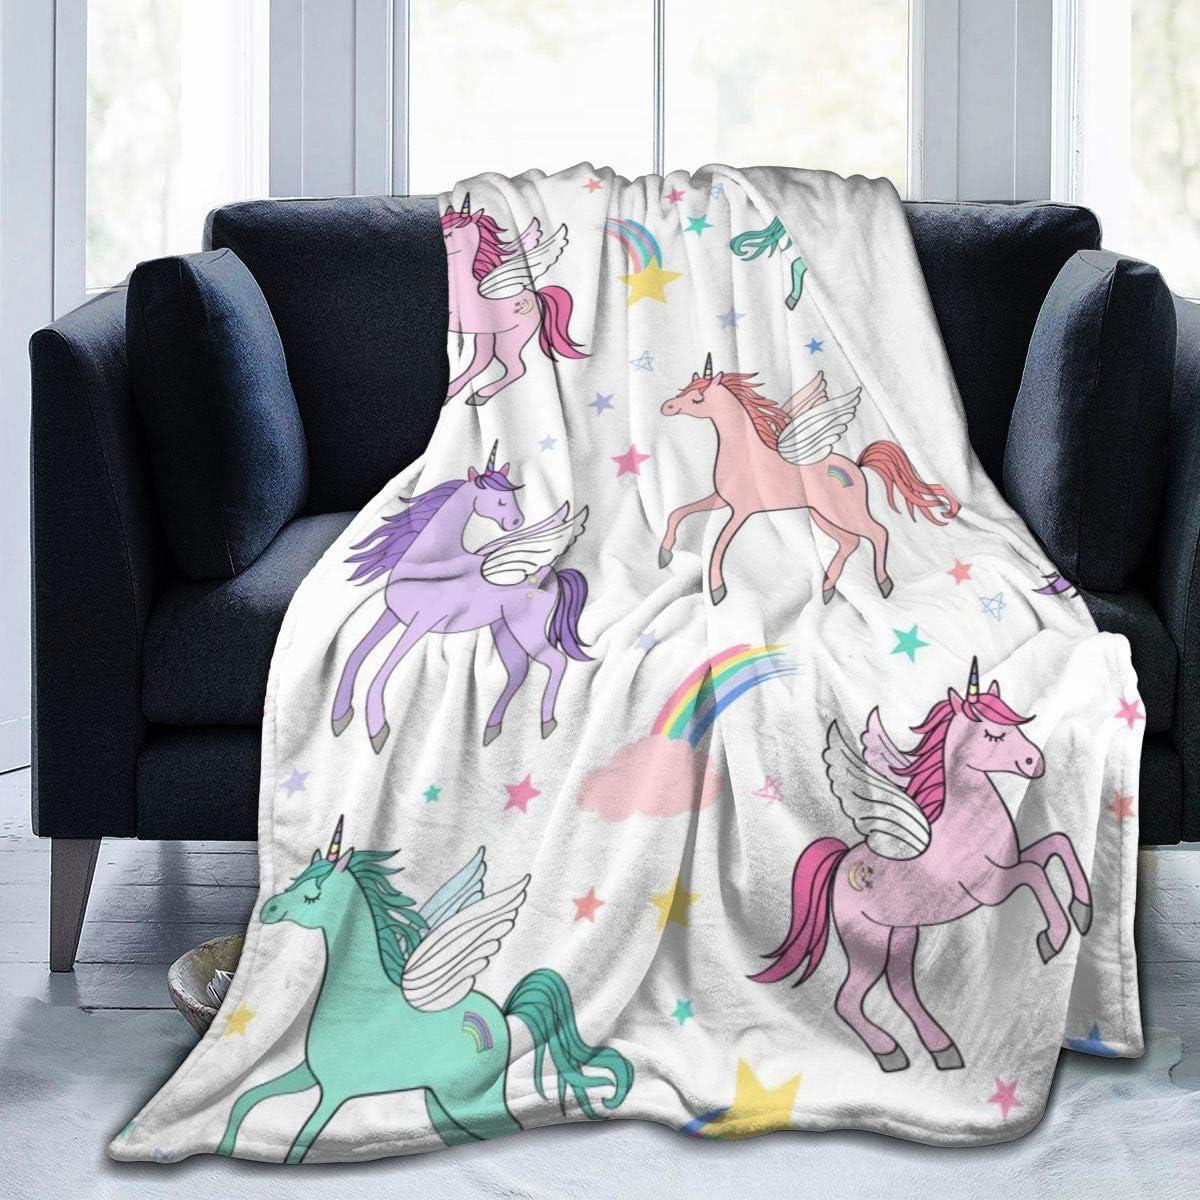 Fleece Plush Throw Blanket Comforter 高額売筋 I 新商品!新型 Pegacorns Flying Unicorns